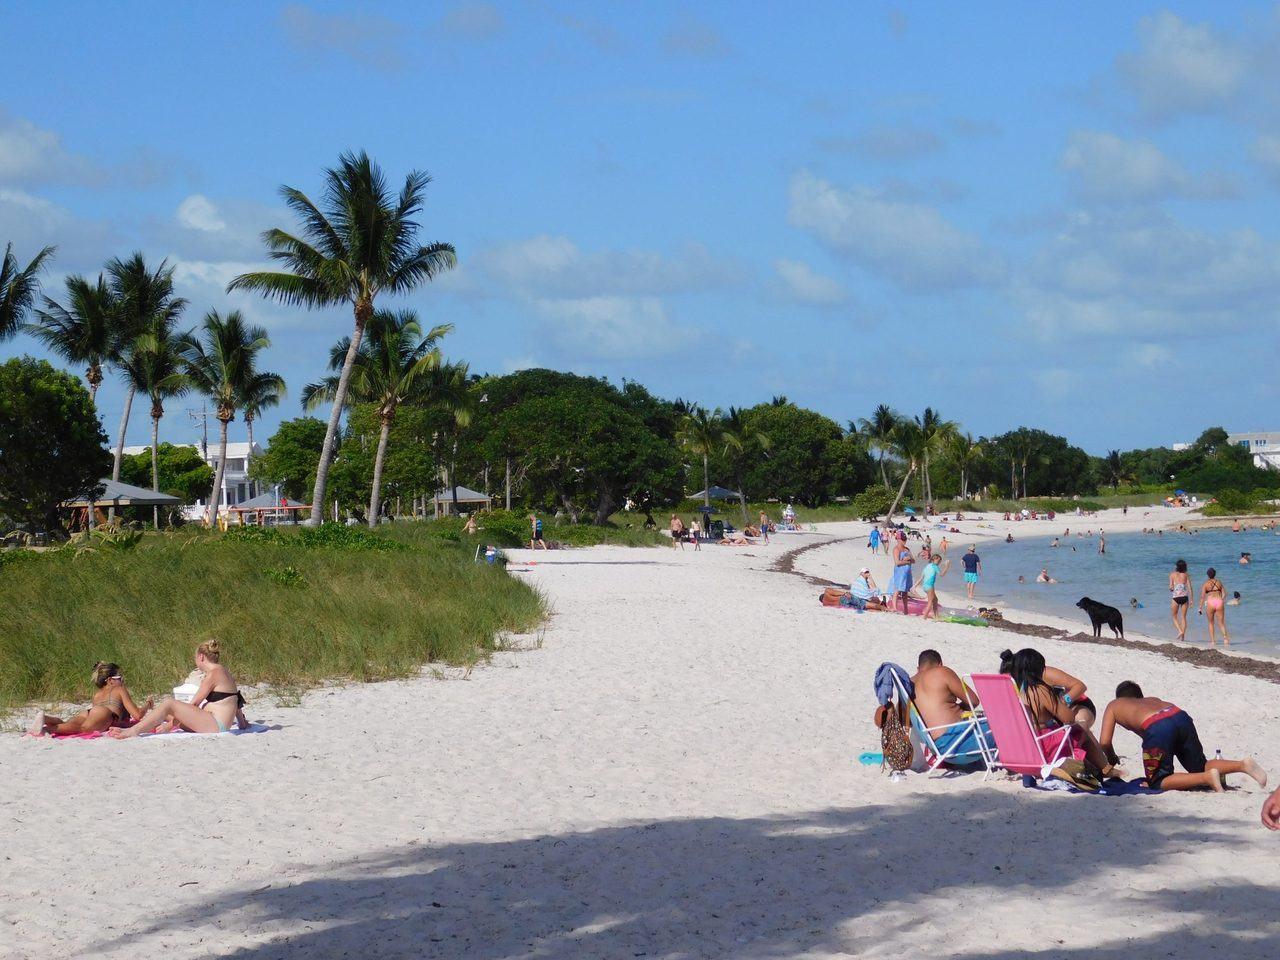 Daytona Beach gratuit datant